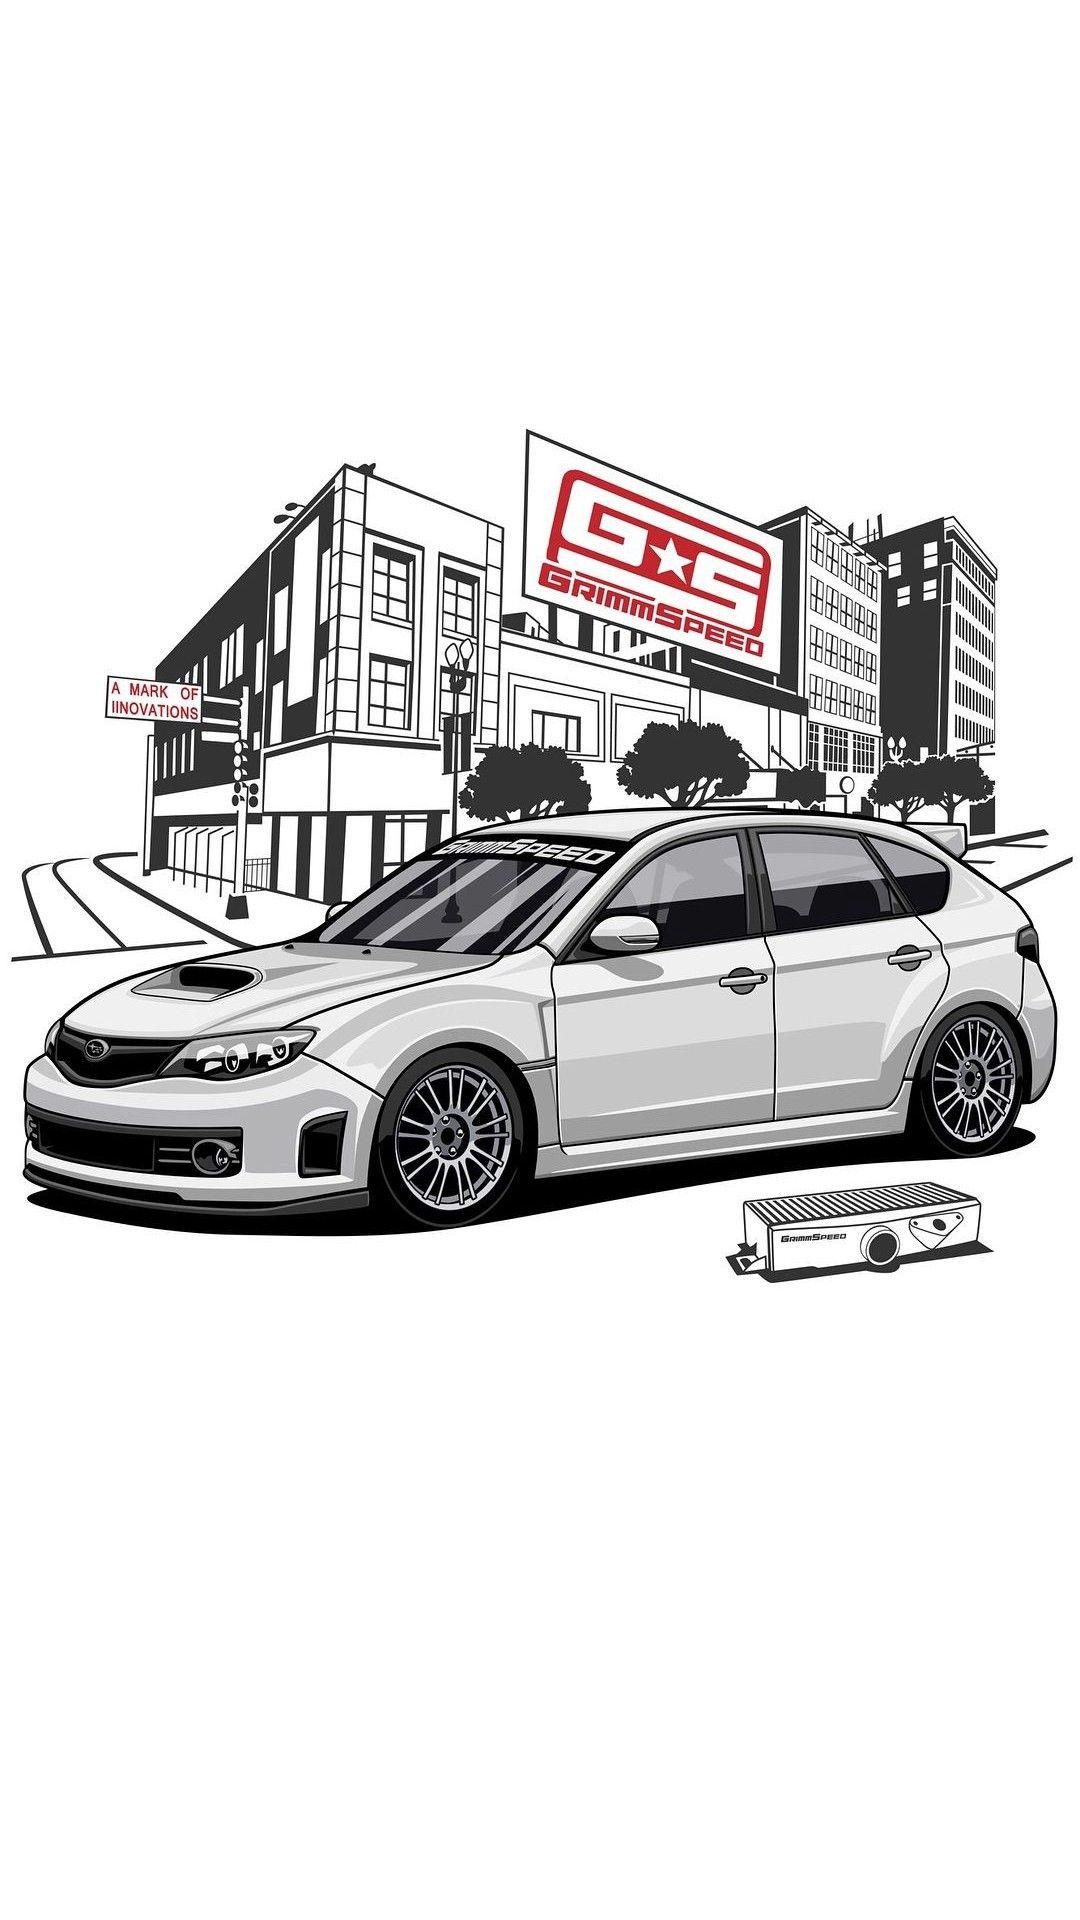 Subaru hatchback subaru impreza jdm wallpaper reliable cars sprint cars car